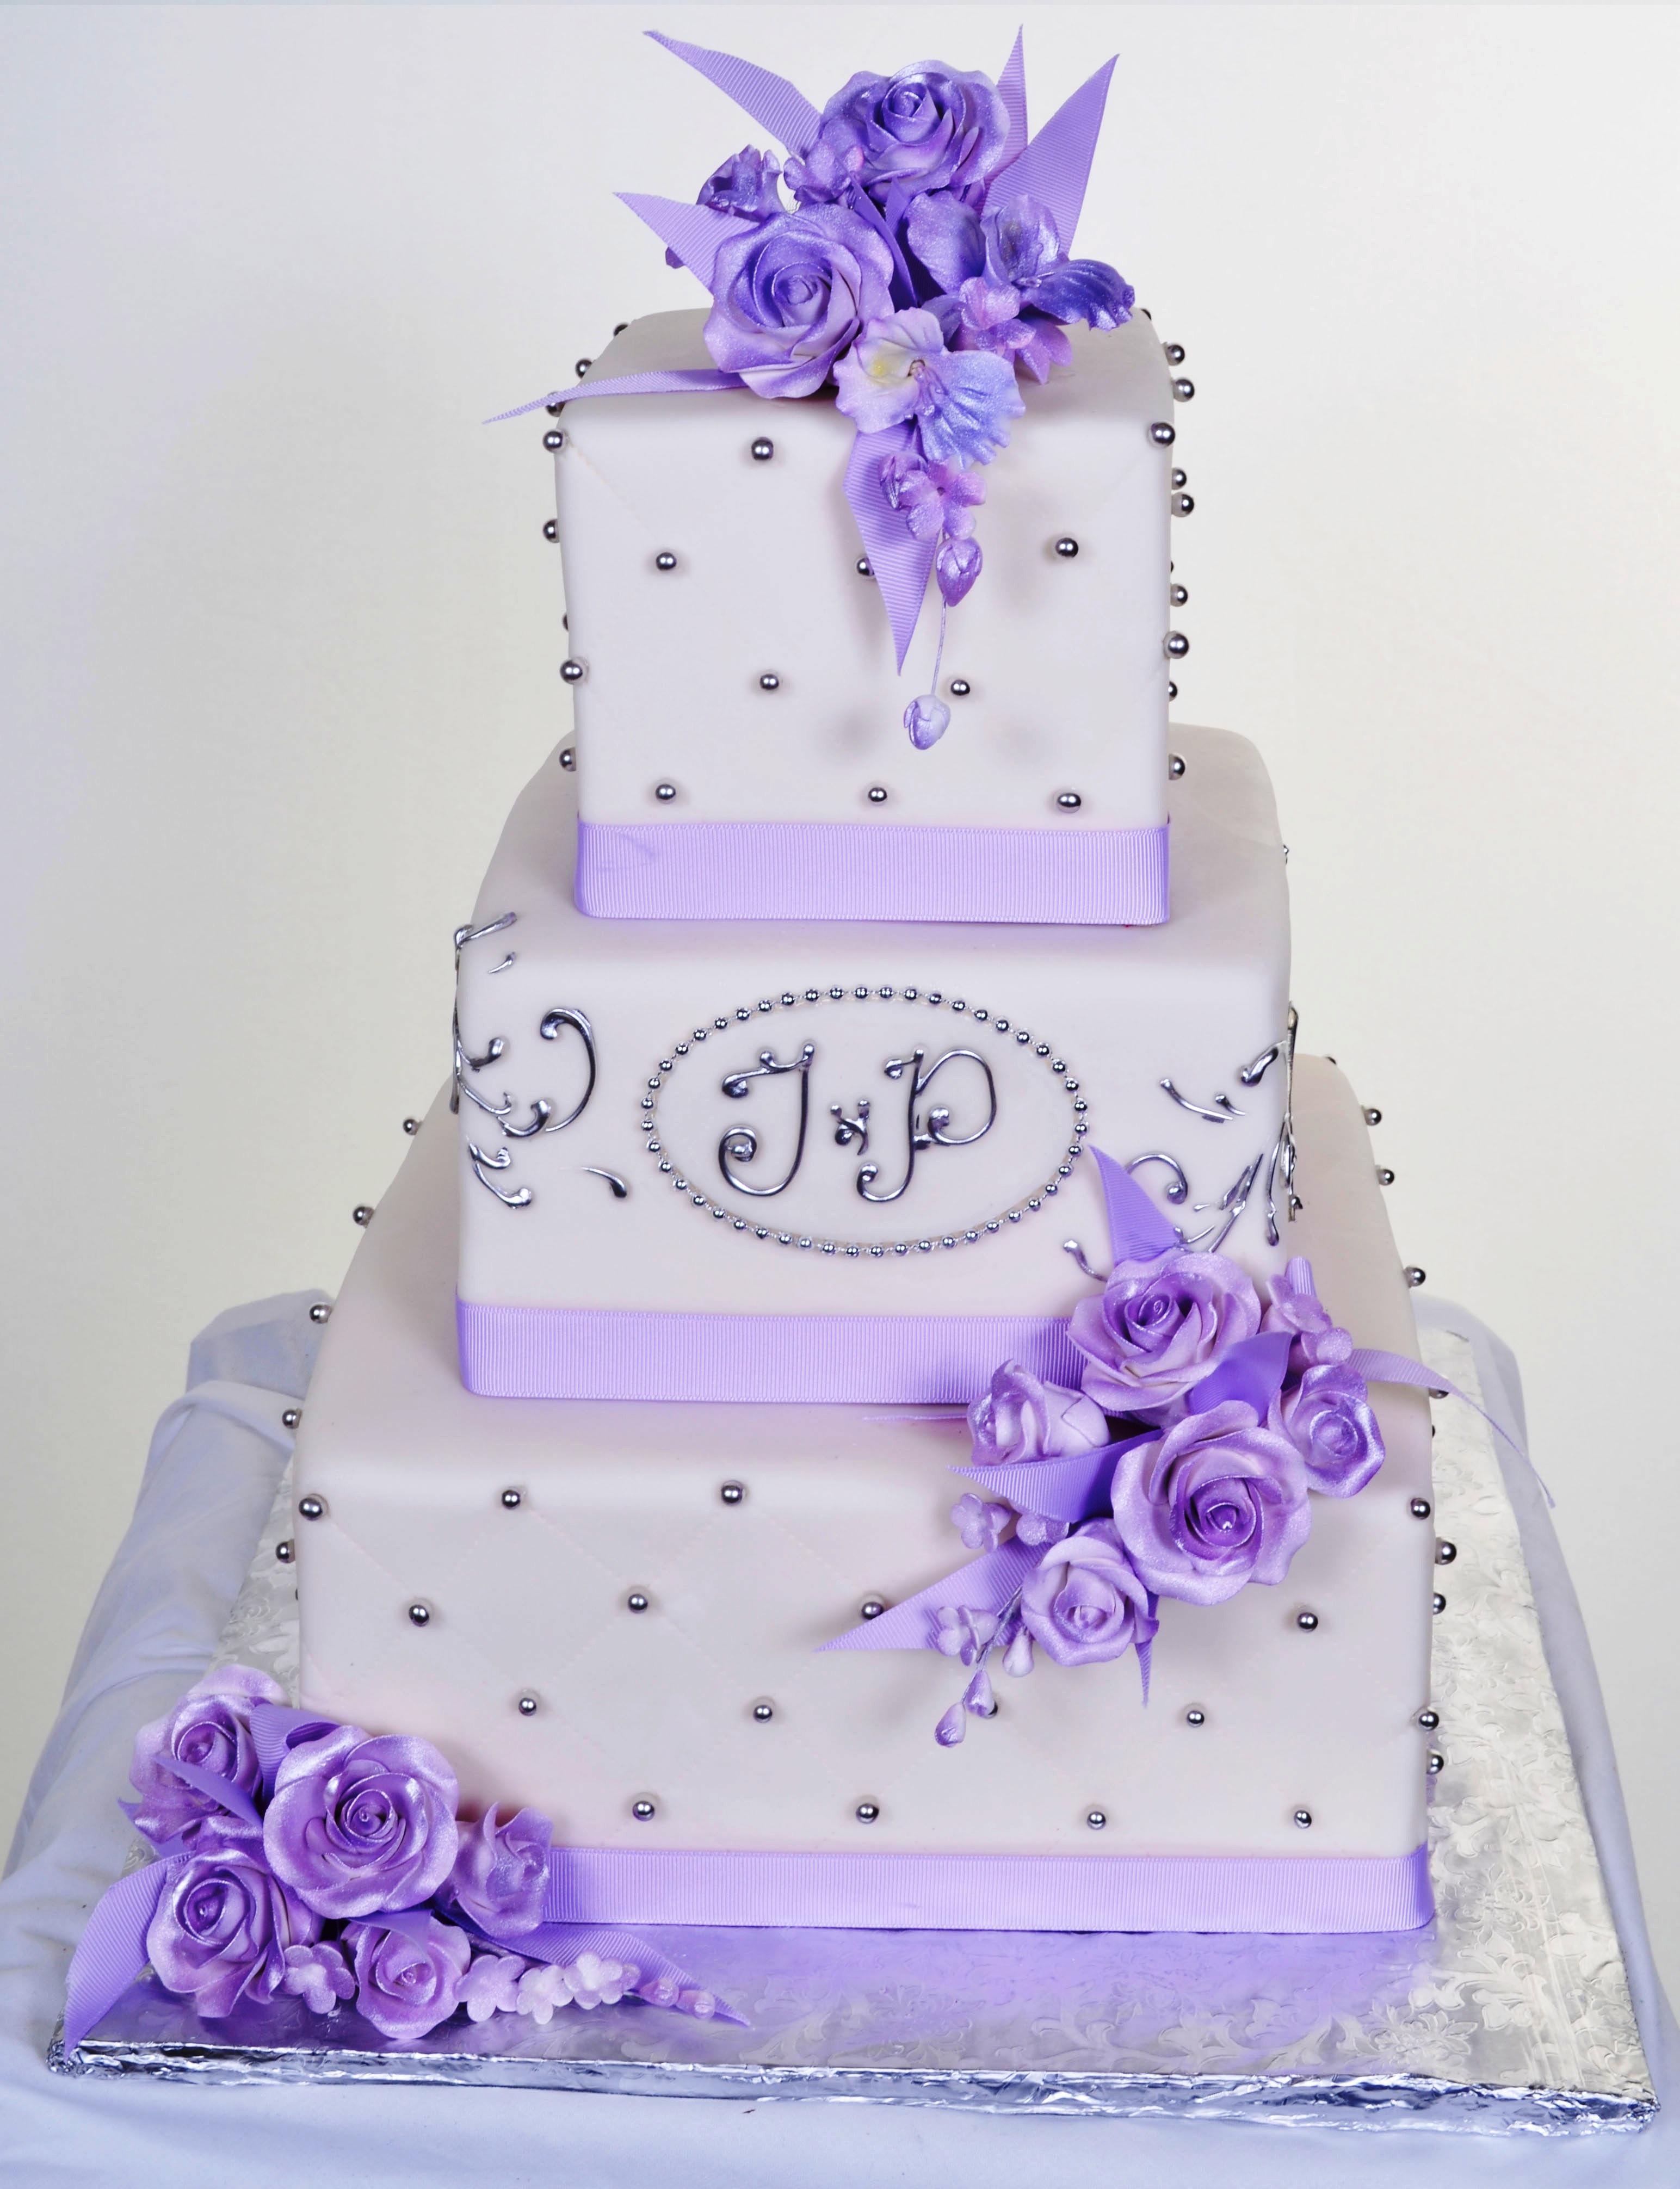 Pastry Palace Las Vegas Wedding Cake 792 - Rosy Tufts